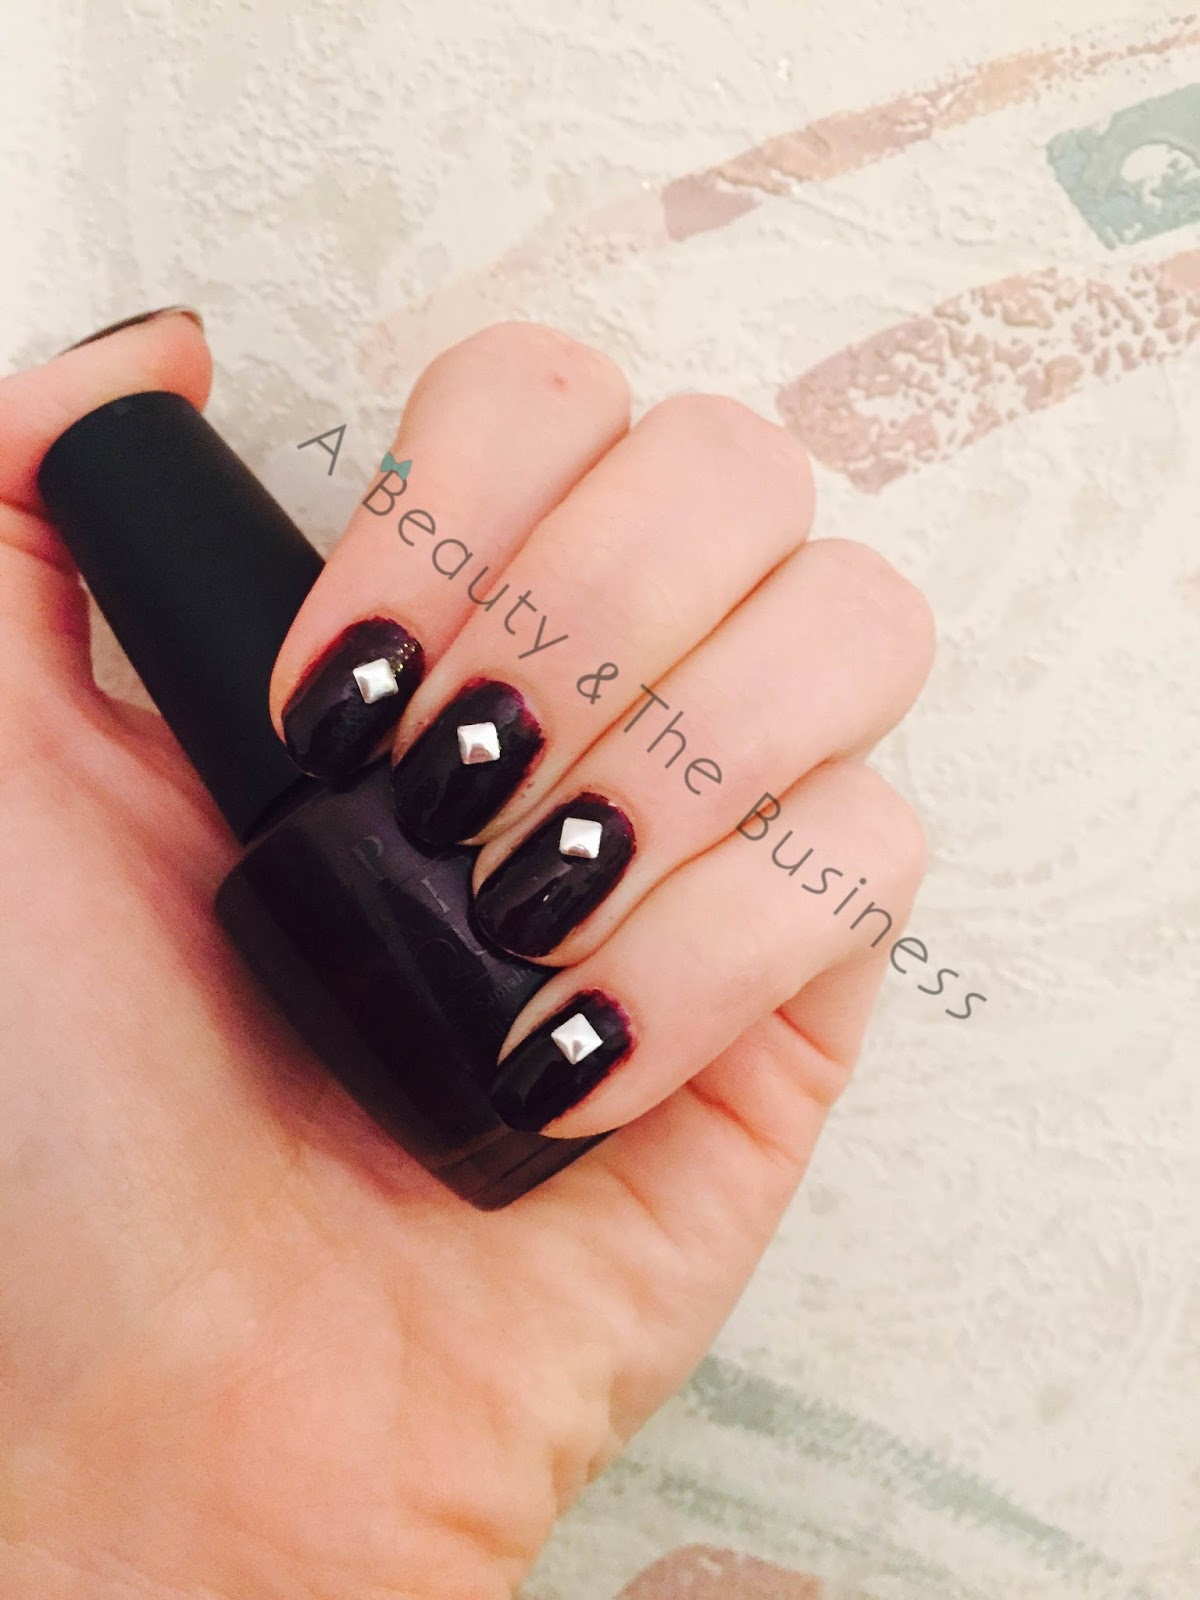 Twinsie Tuesday, Twinsie Tuesday vampy nails, twinsie tuesday nail art, opi, opi black cherry chutney,